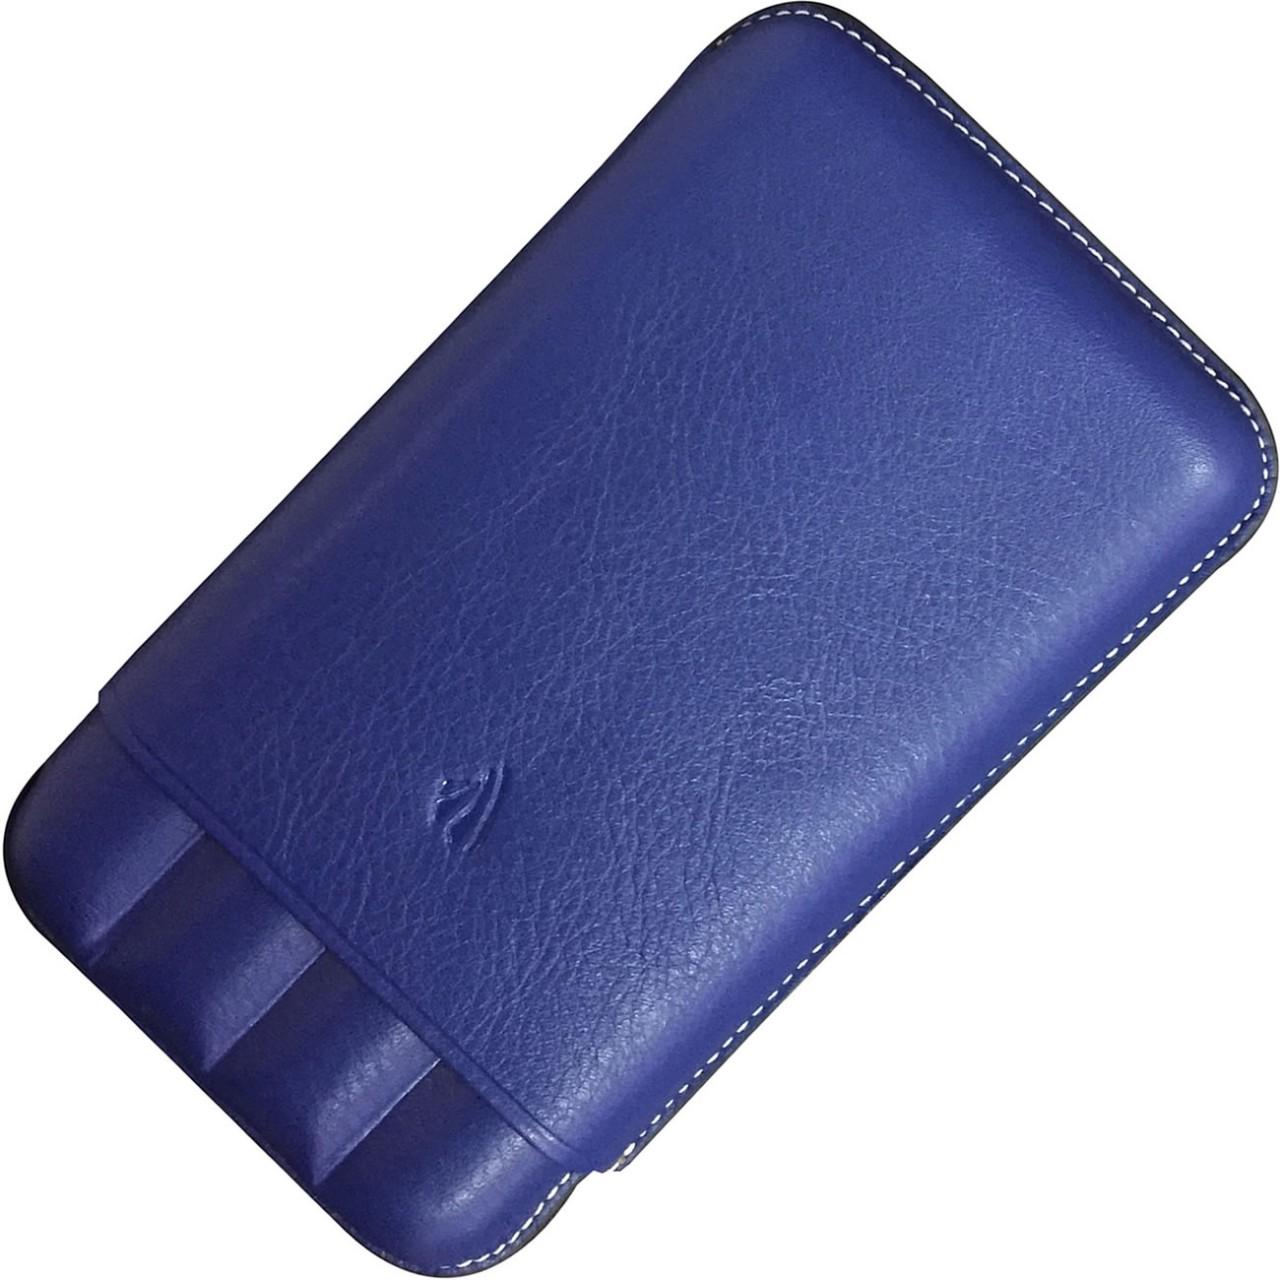 COLLECTOR 4-PEN CASE * RIVIERA BLUE